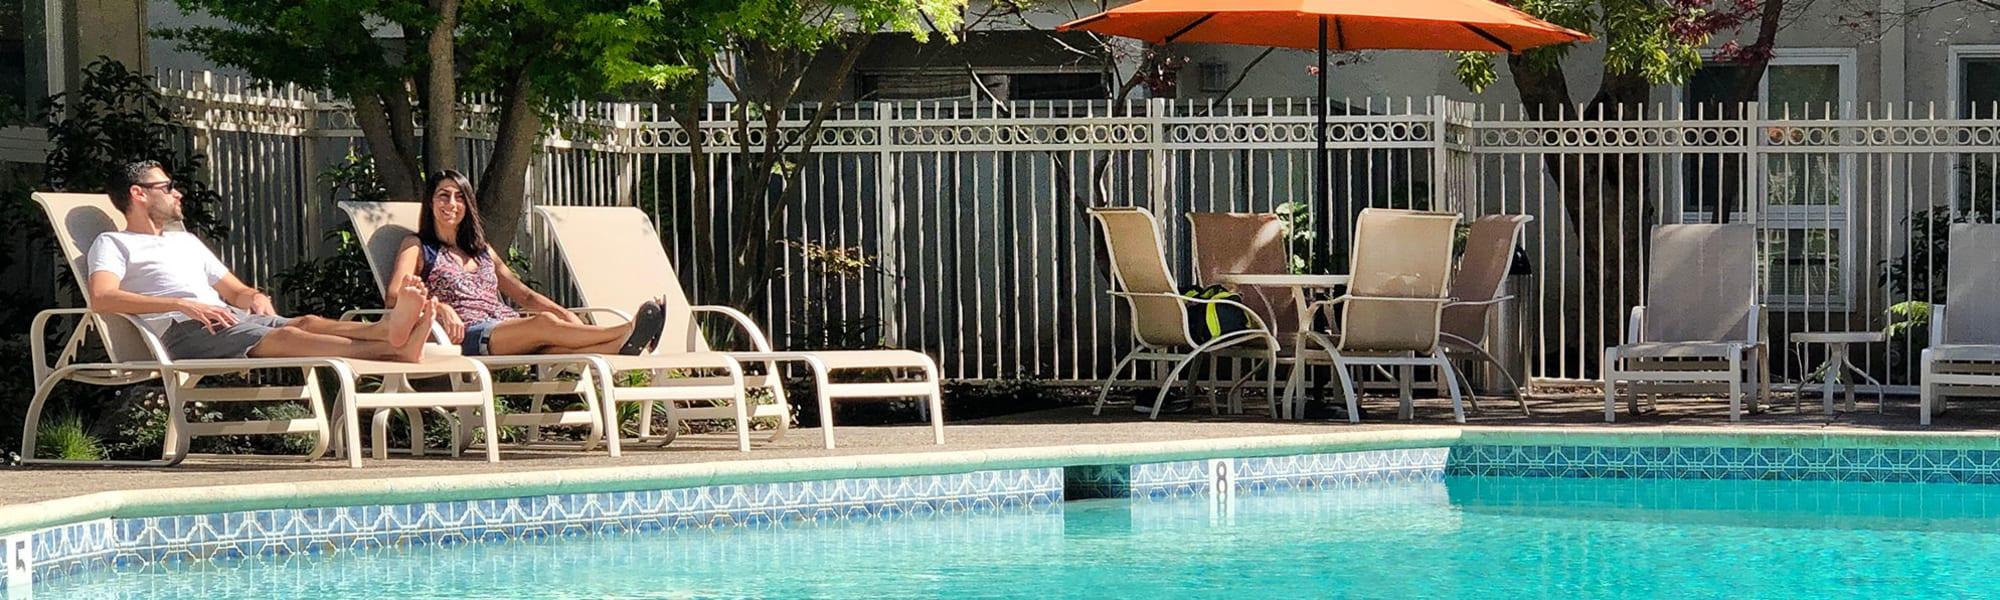 Amenities at Newport Apartments in Campbell, California